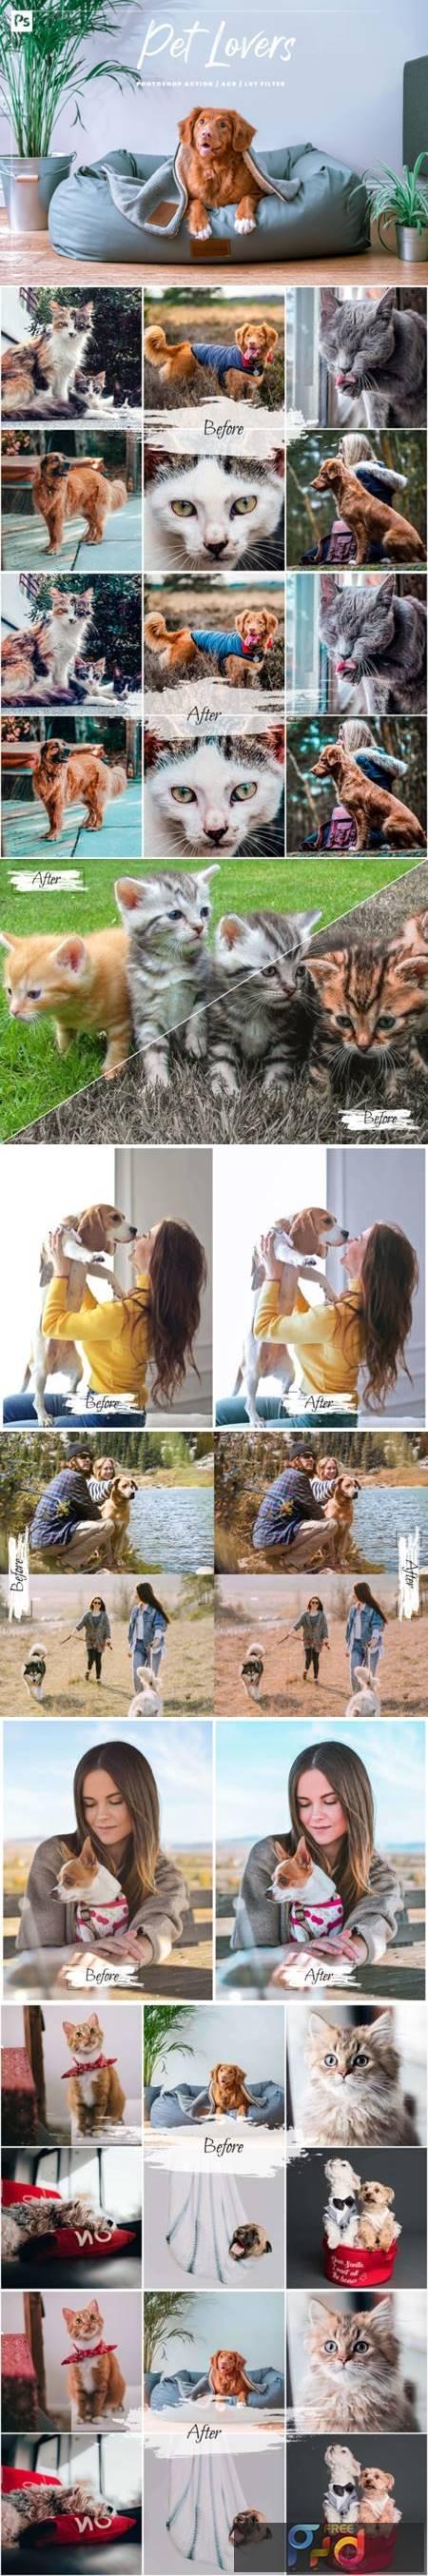 10 Pet Lovers Photoshop Action 8692472 1